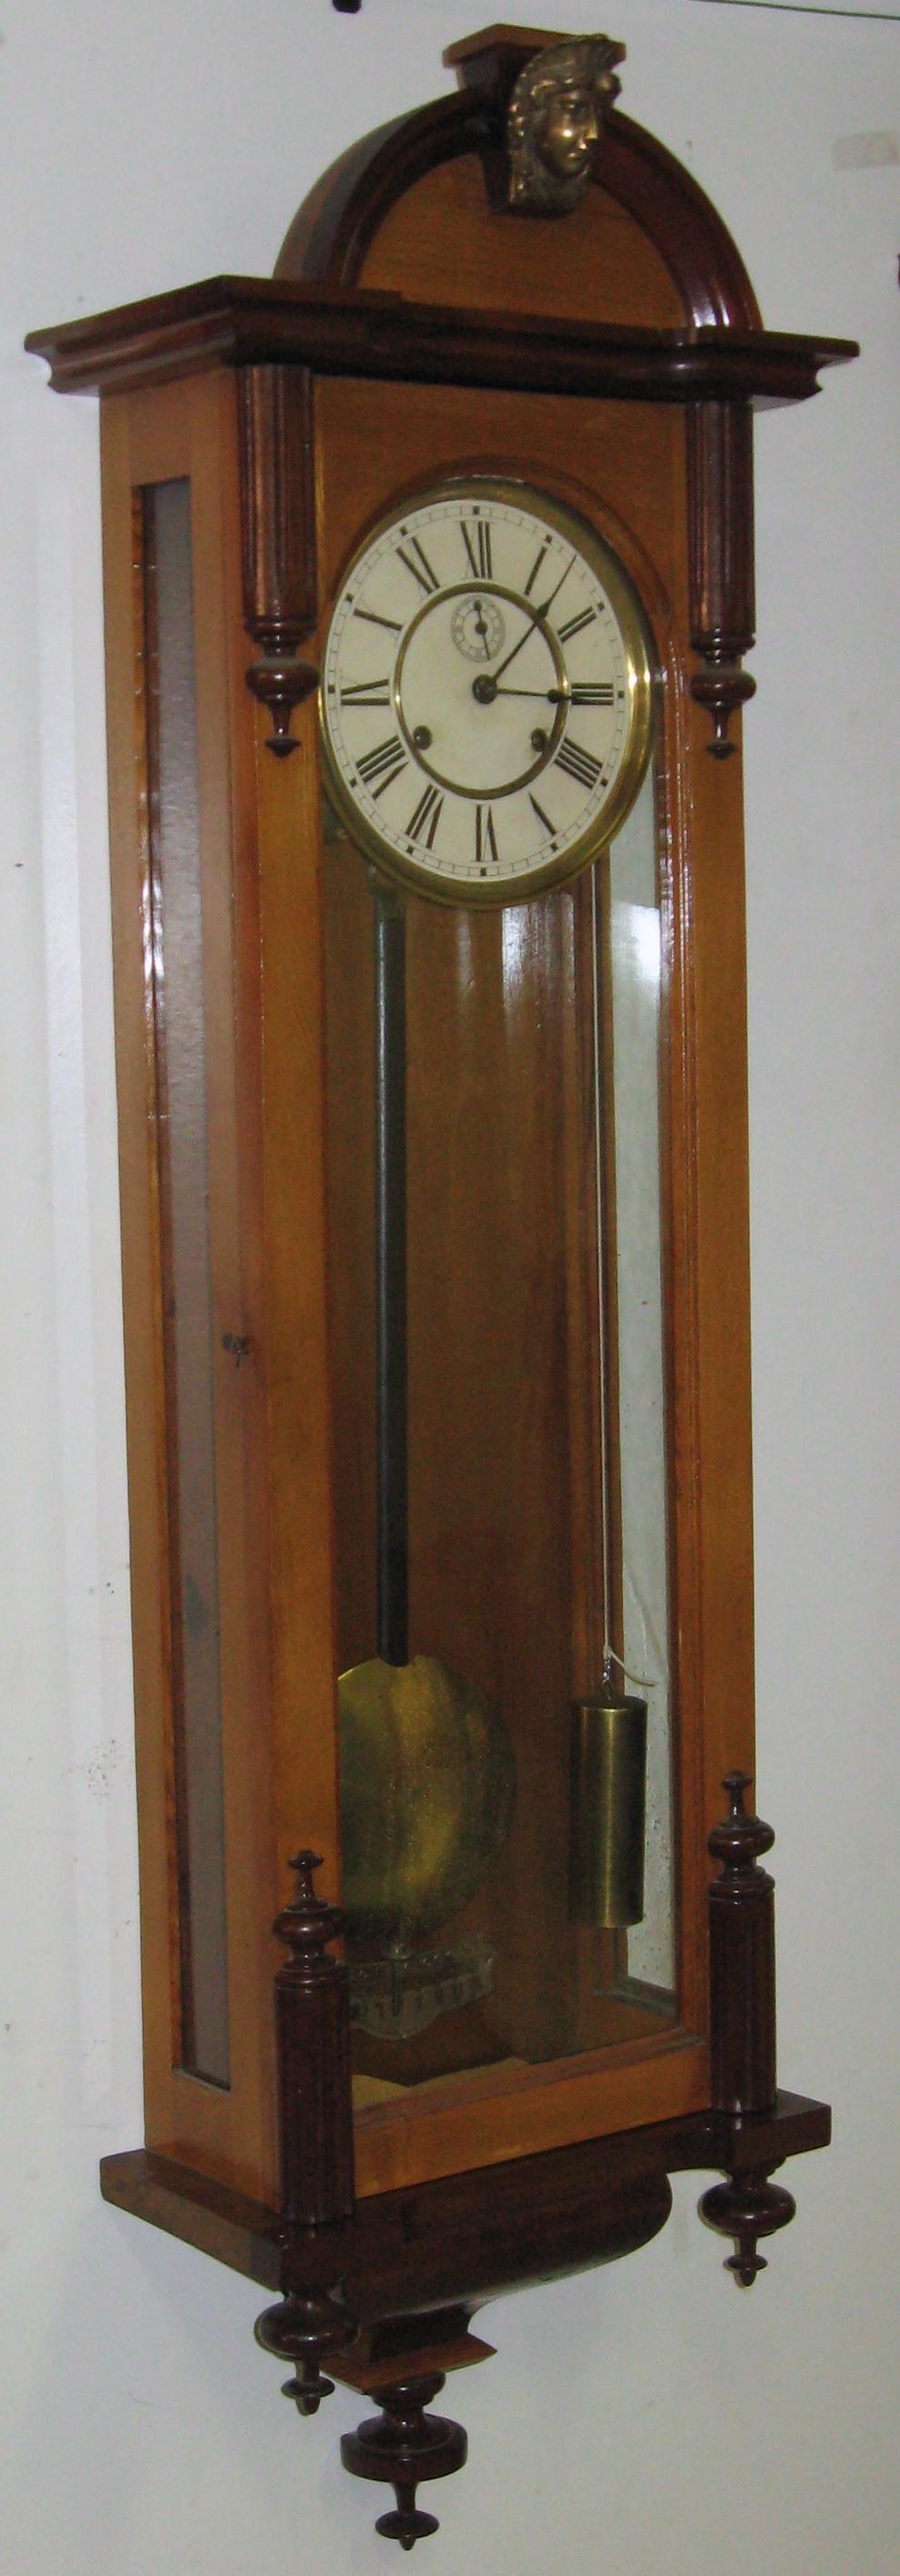 Ansonia Capitol Weight Driven Wall Clock Clockinfo Com